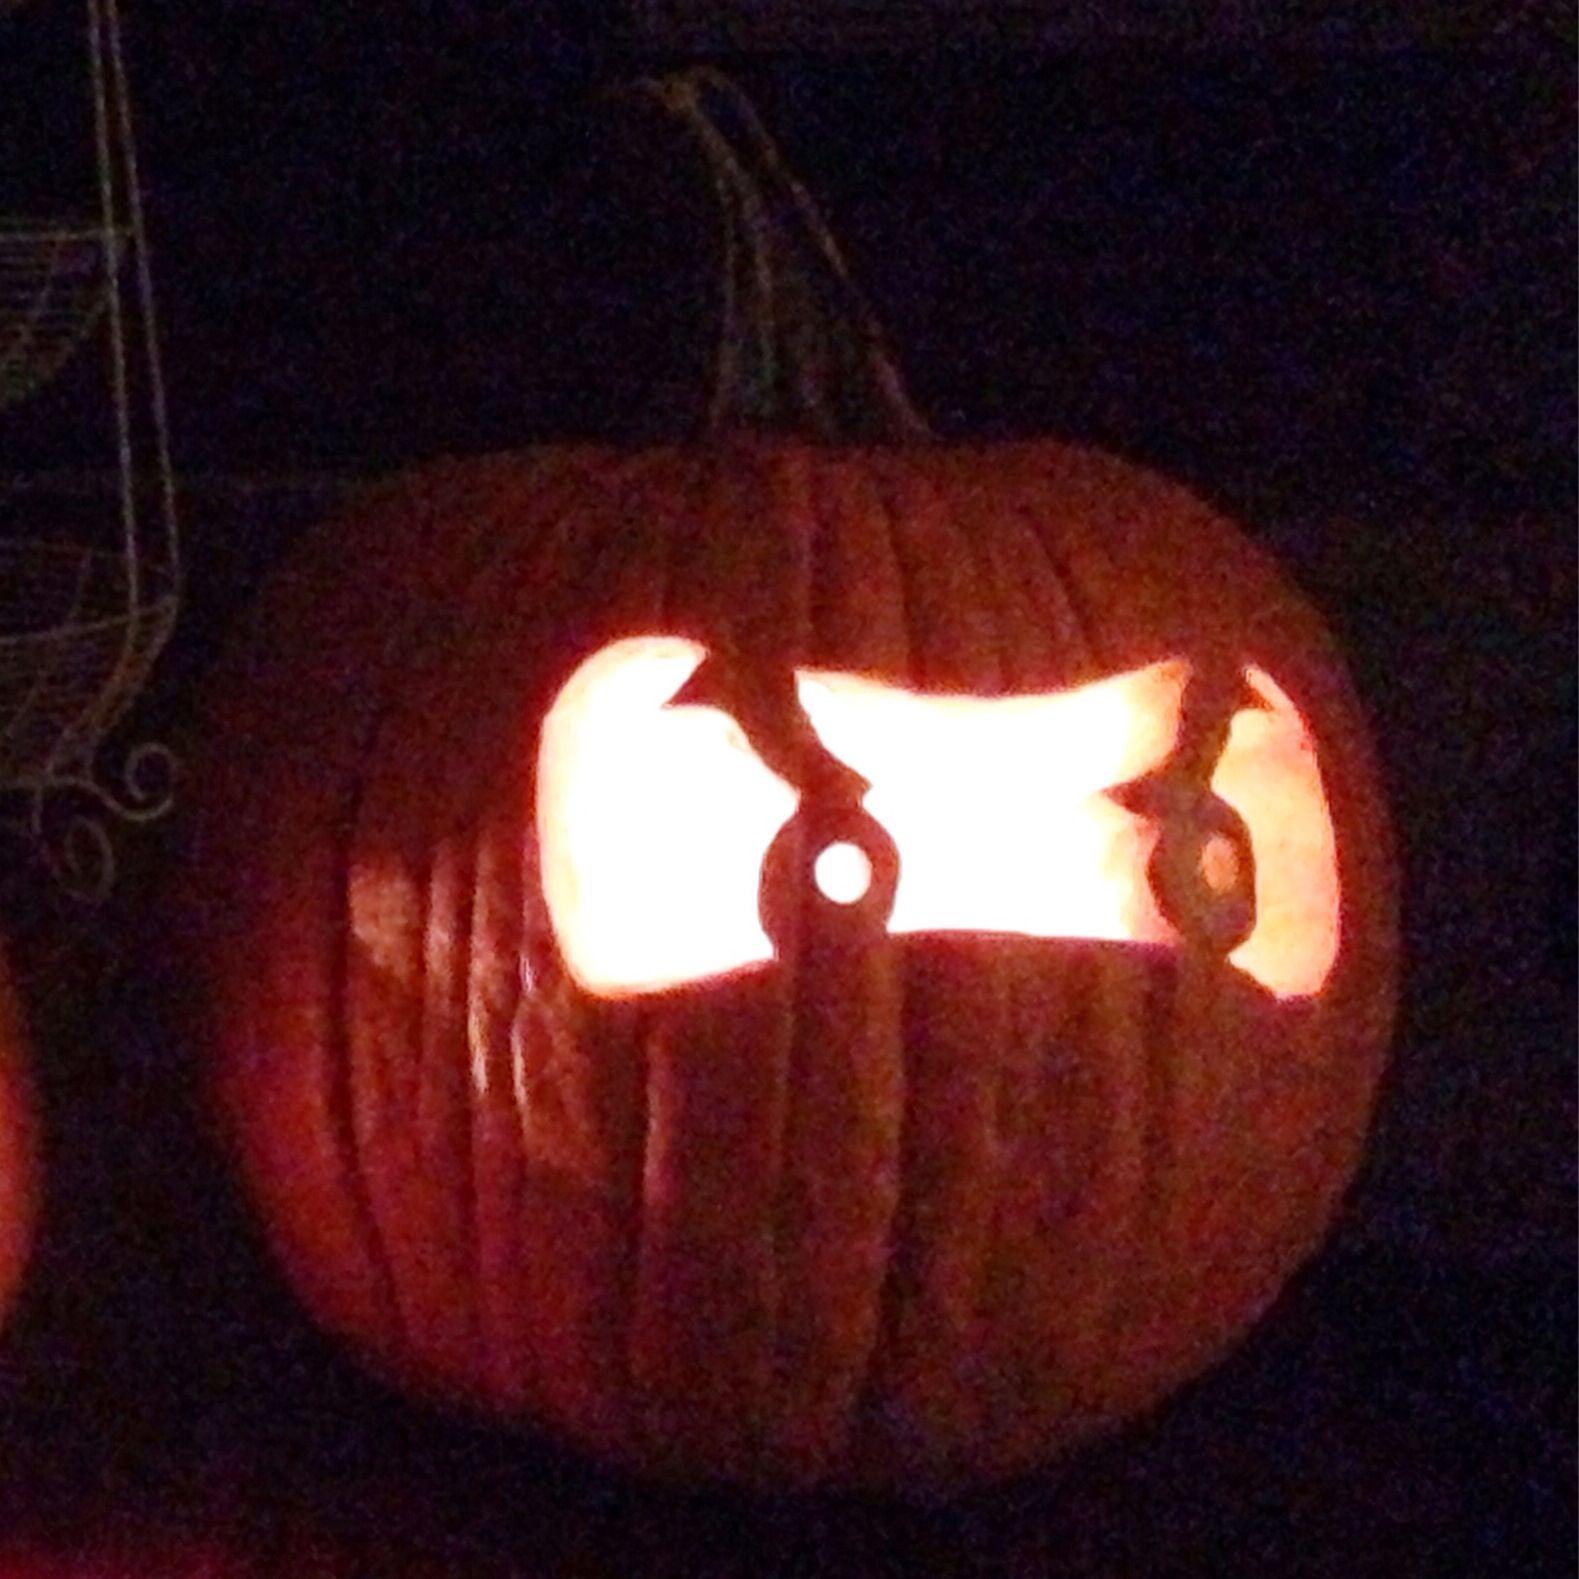 ninjago pumpkin template  Ninjago pumpkin for Halloween | Pumpkin carving, Halloween ...